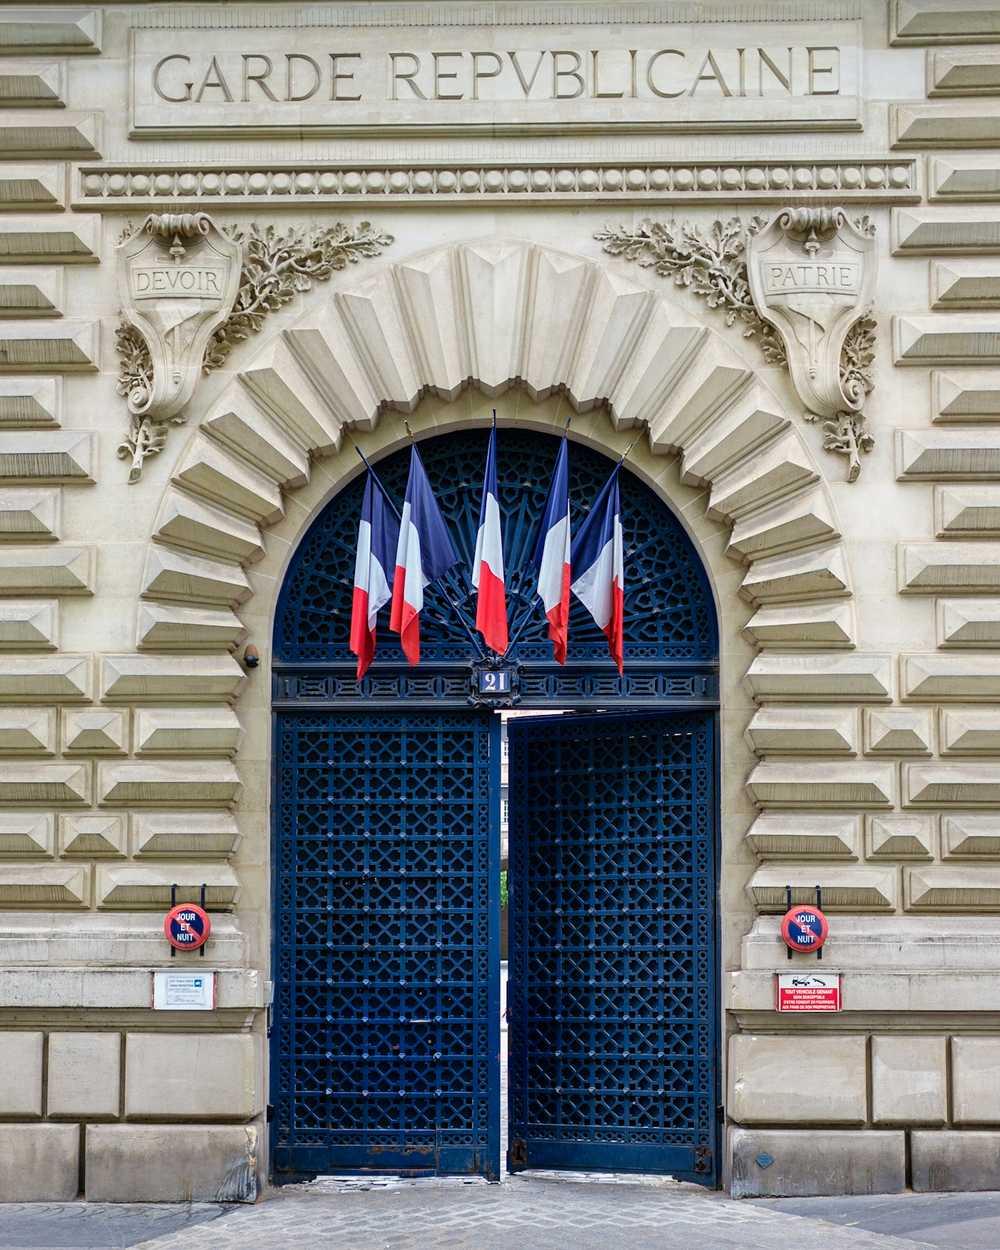 Caserne Monge — a Garde républicaine barracks